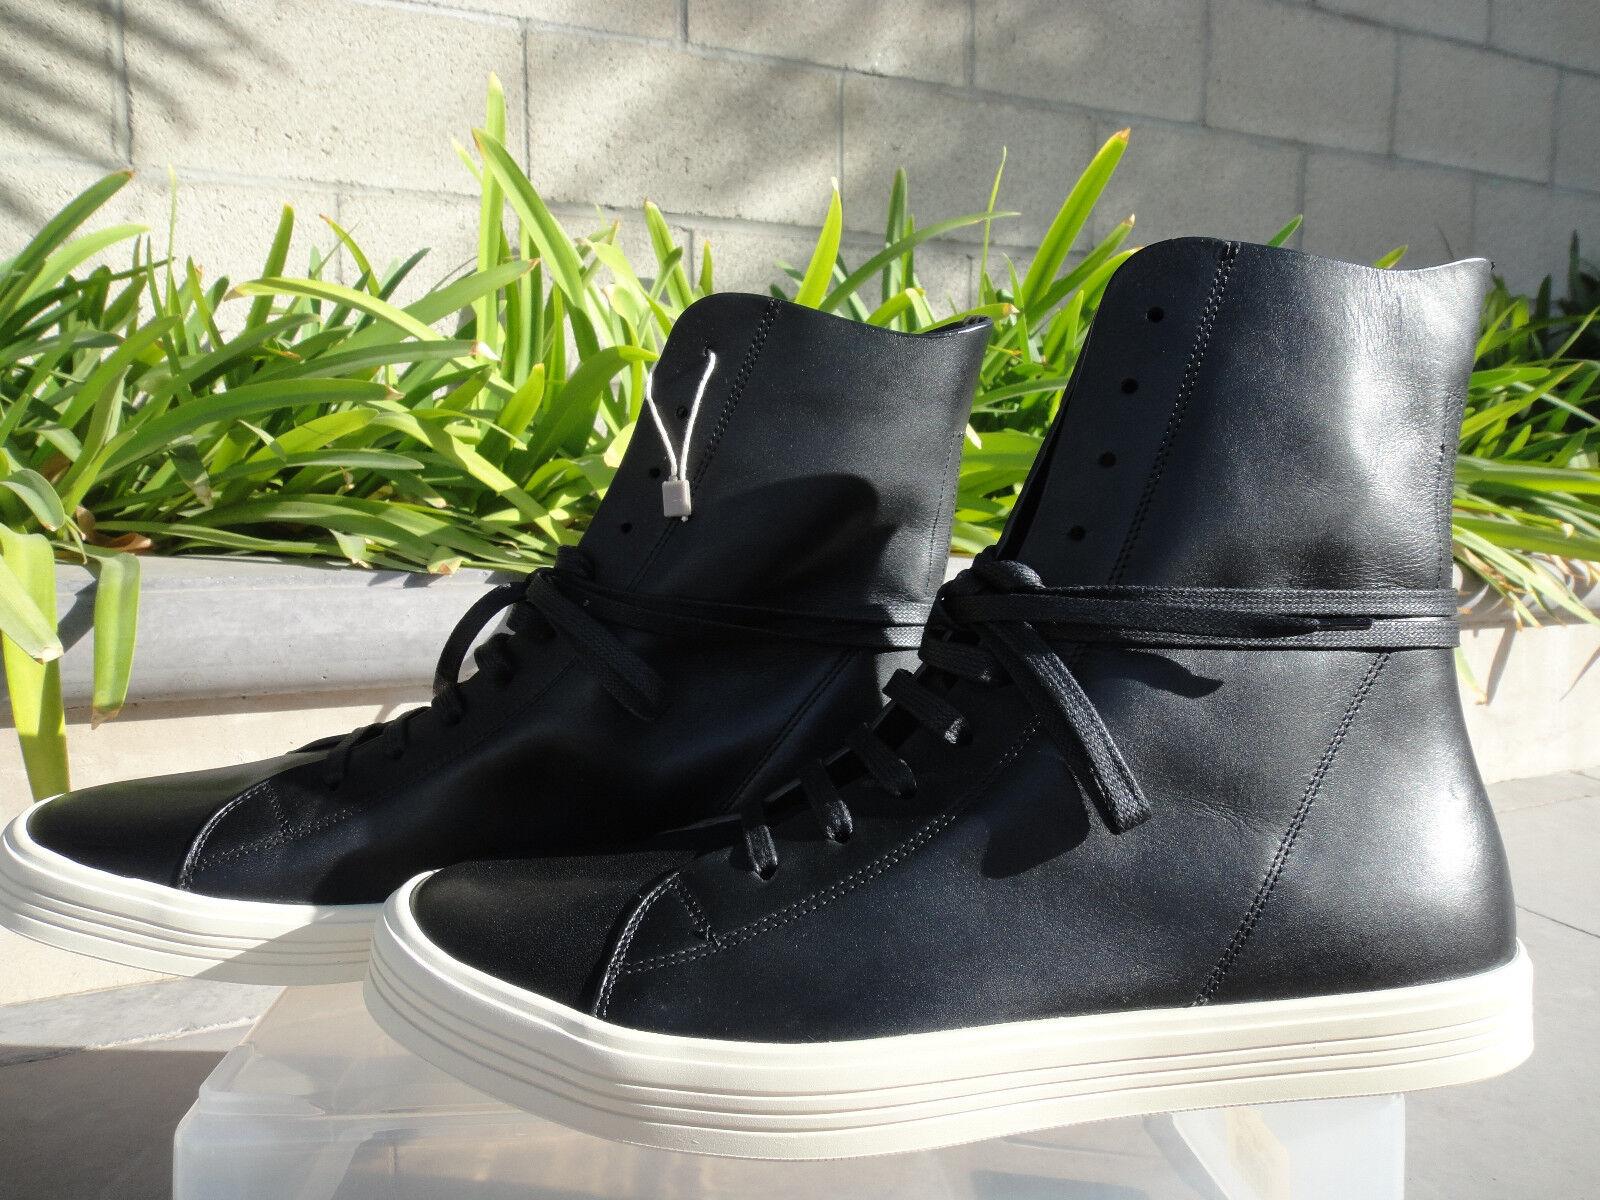 Rick Owens MASTODON scarpe da ginnastica, Hi Top Leather , Pick US Dimensione  NIB MSRP 1050